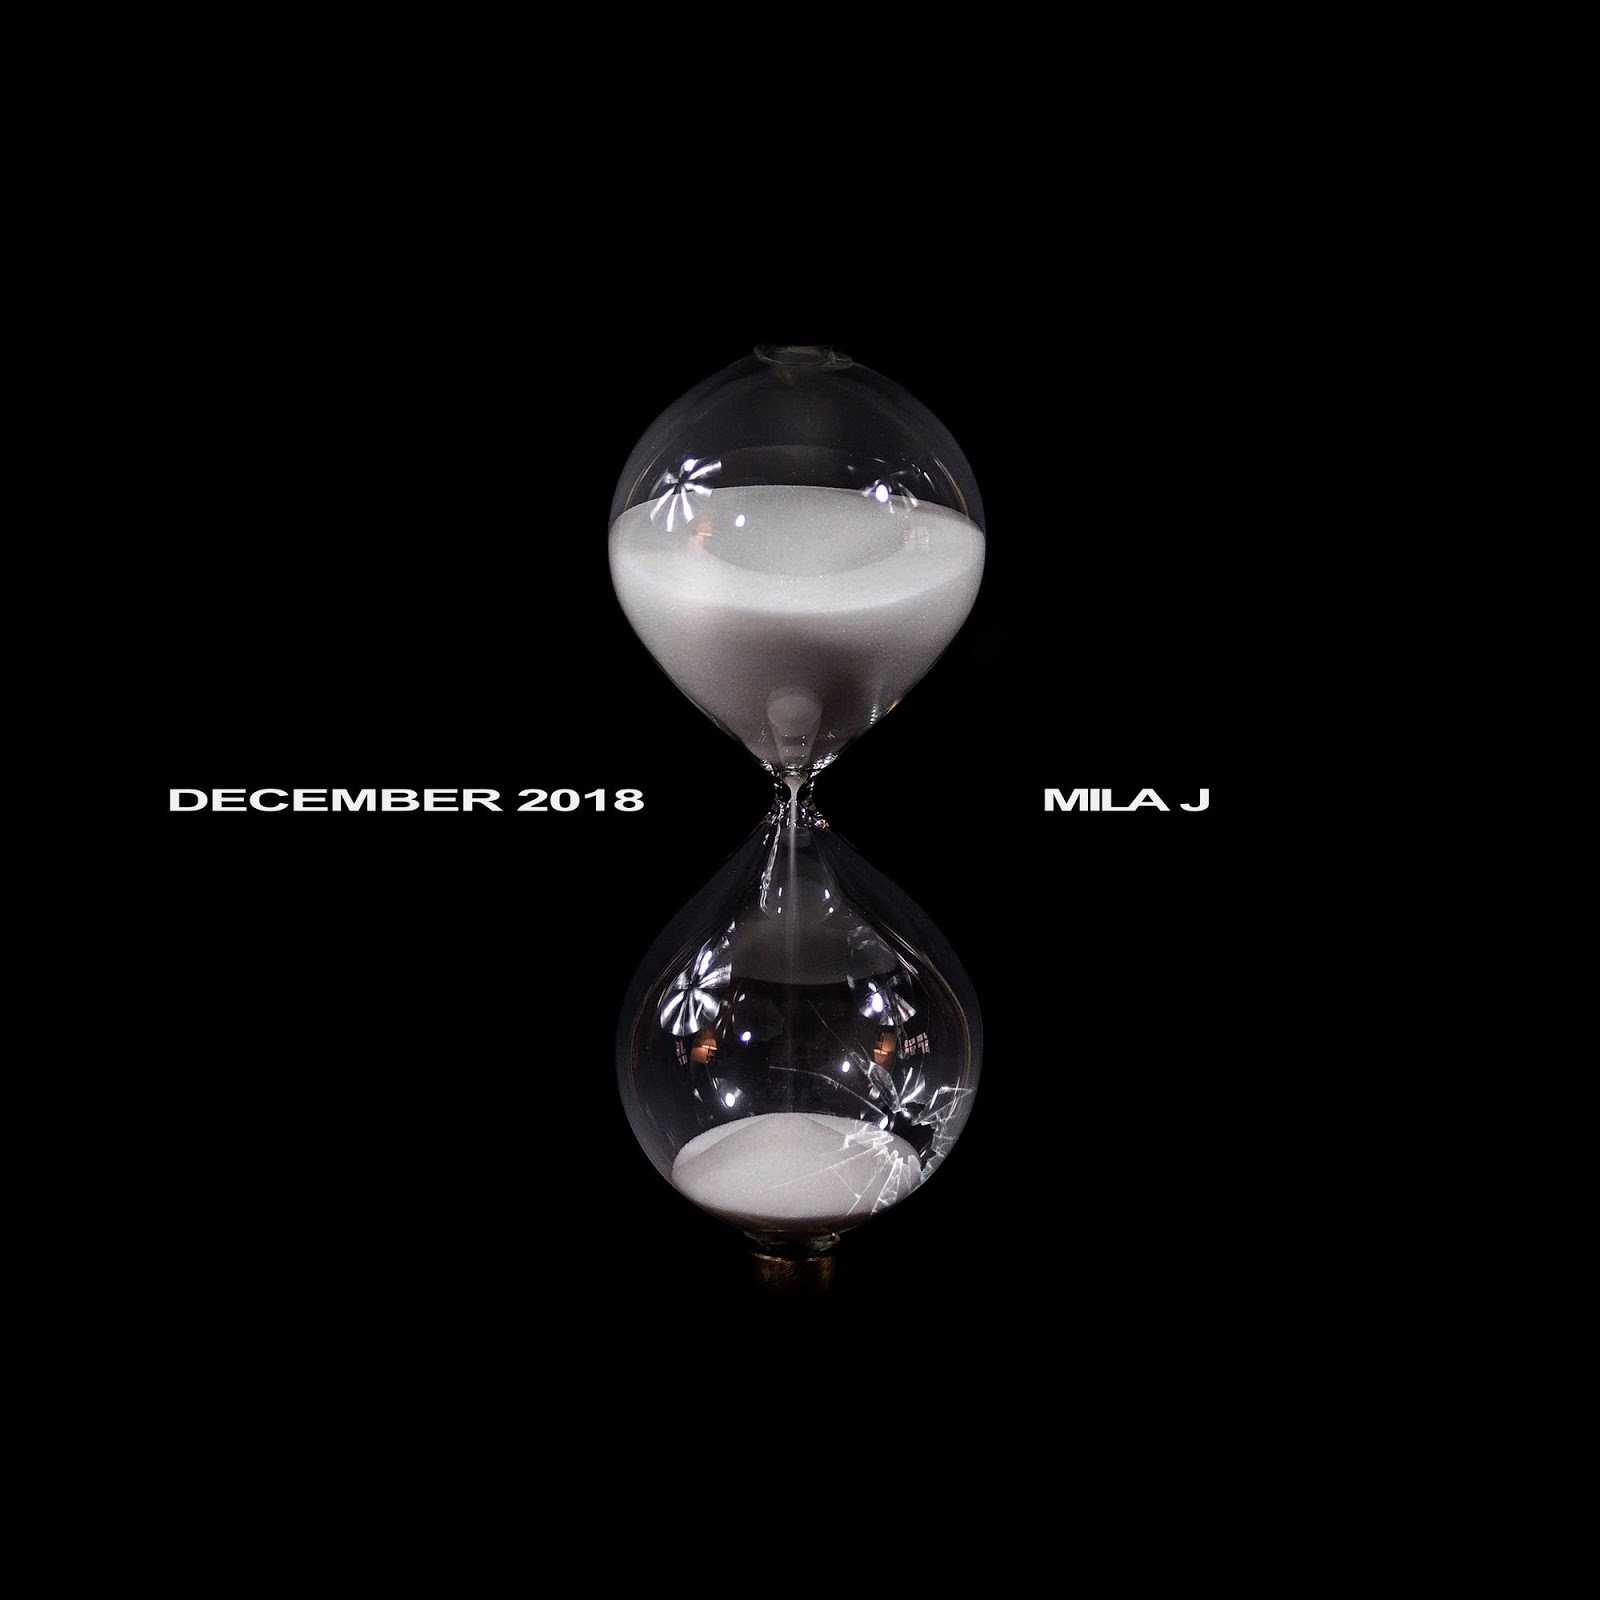 EP Stream: Mila J | December 2018 [Audio]